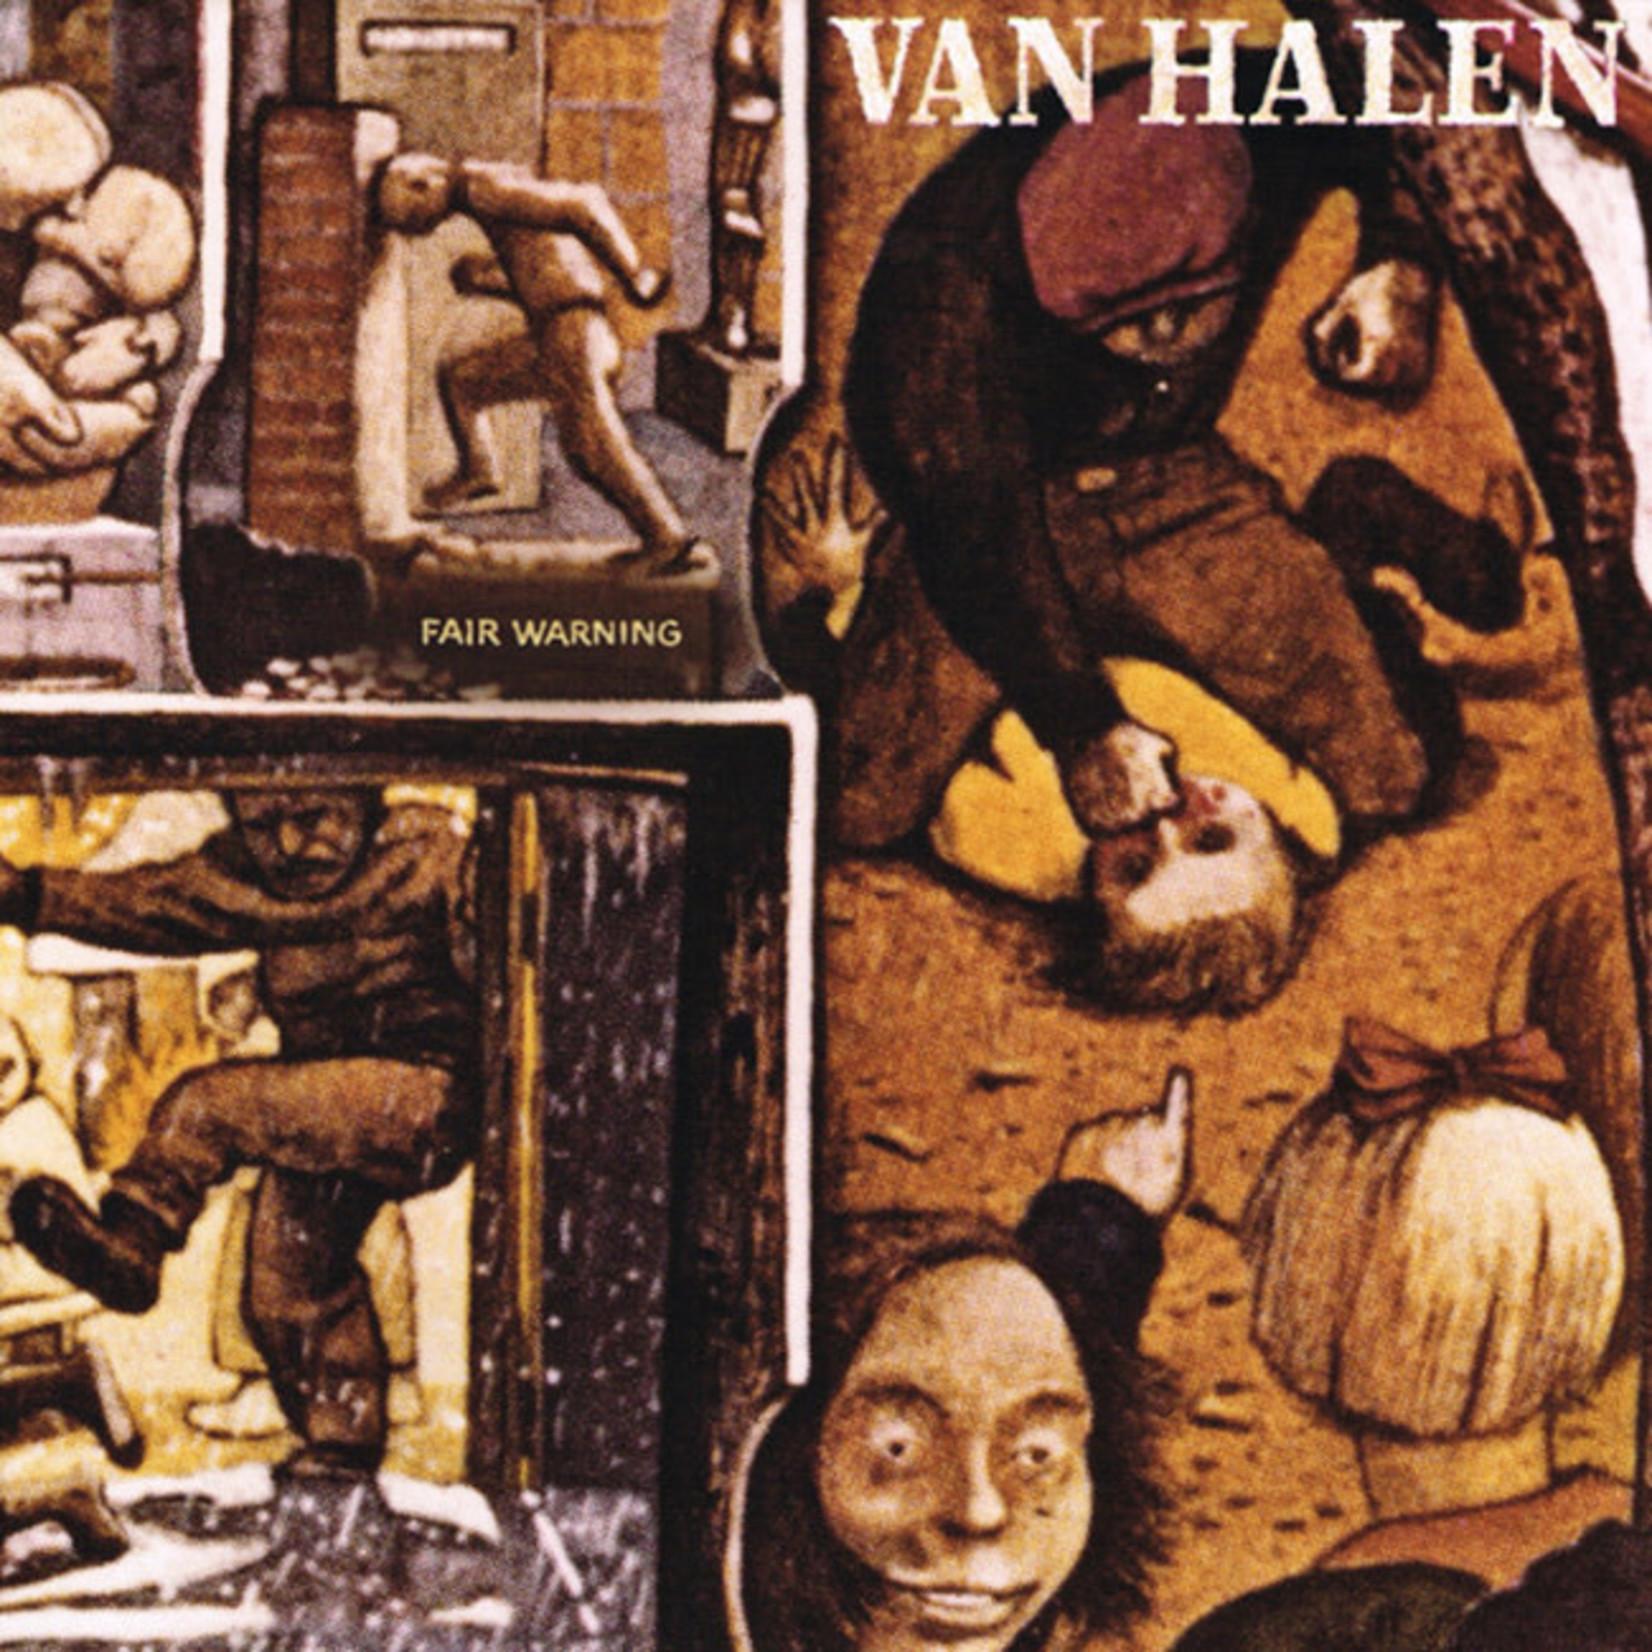 [New] Van Halen: Fair Warning